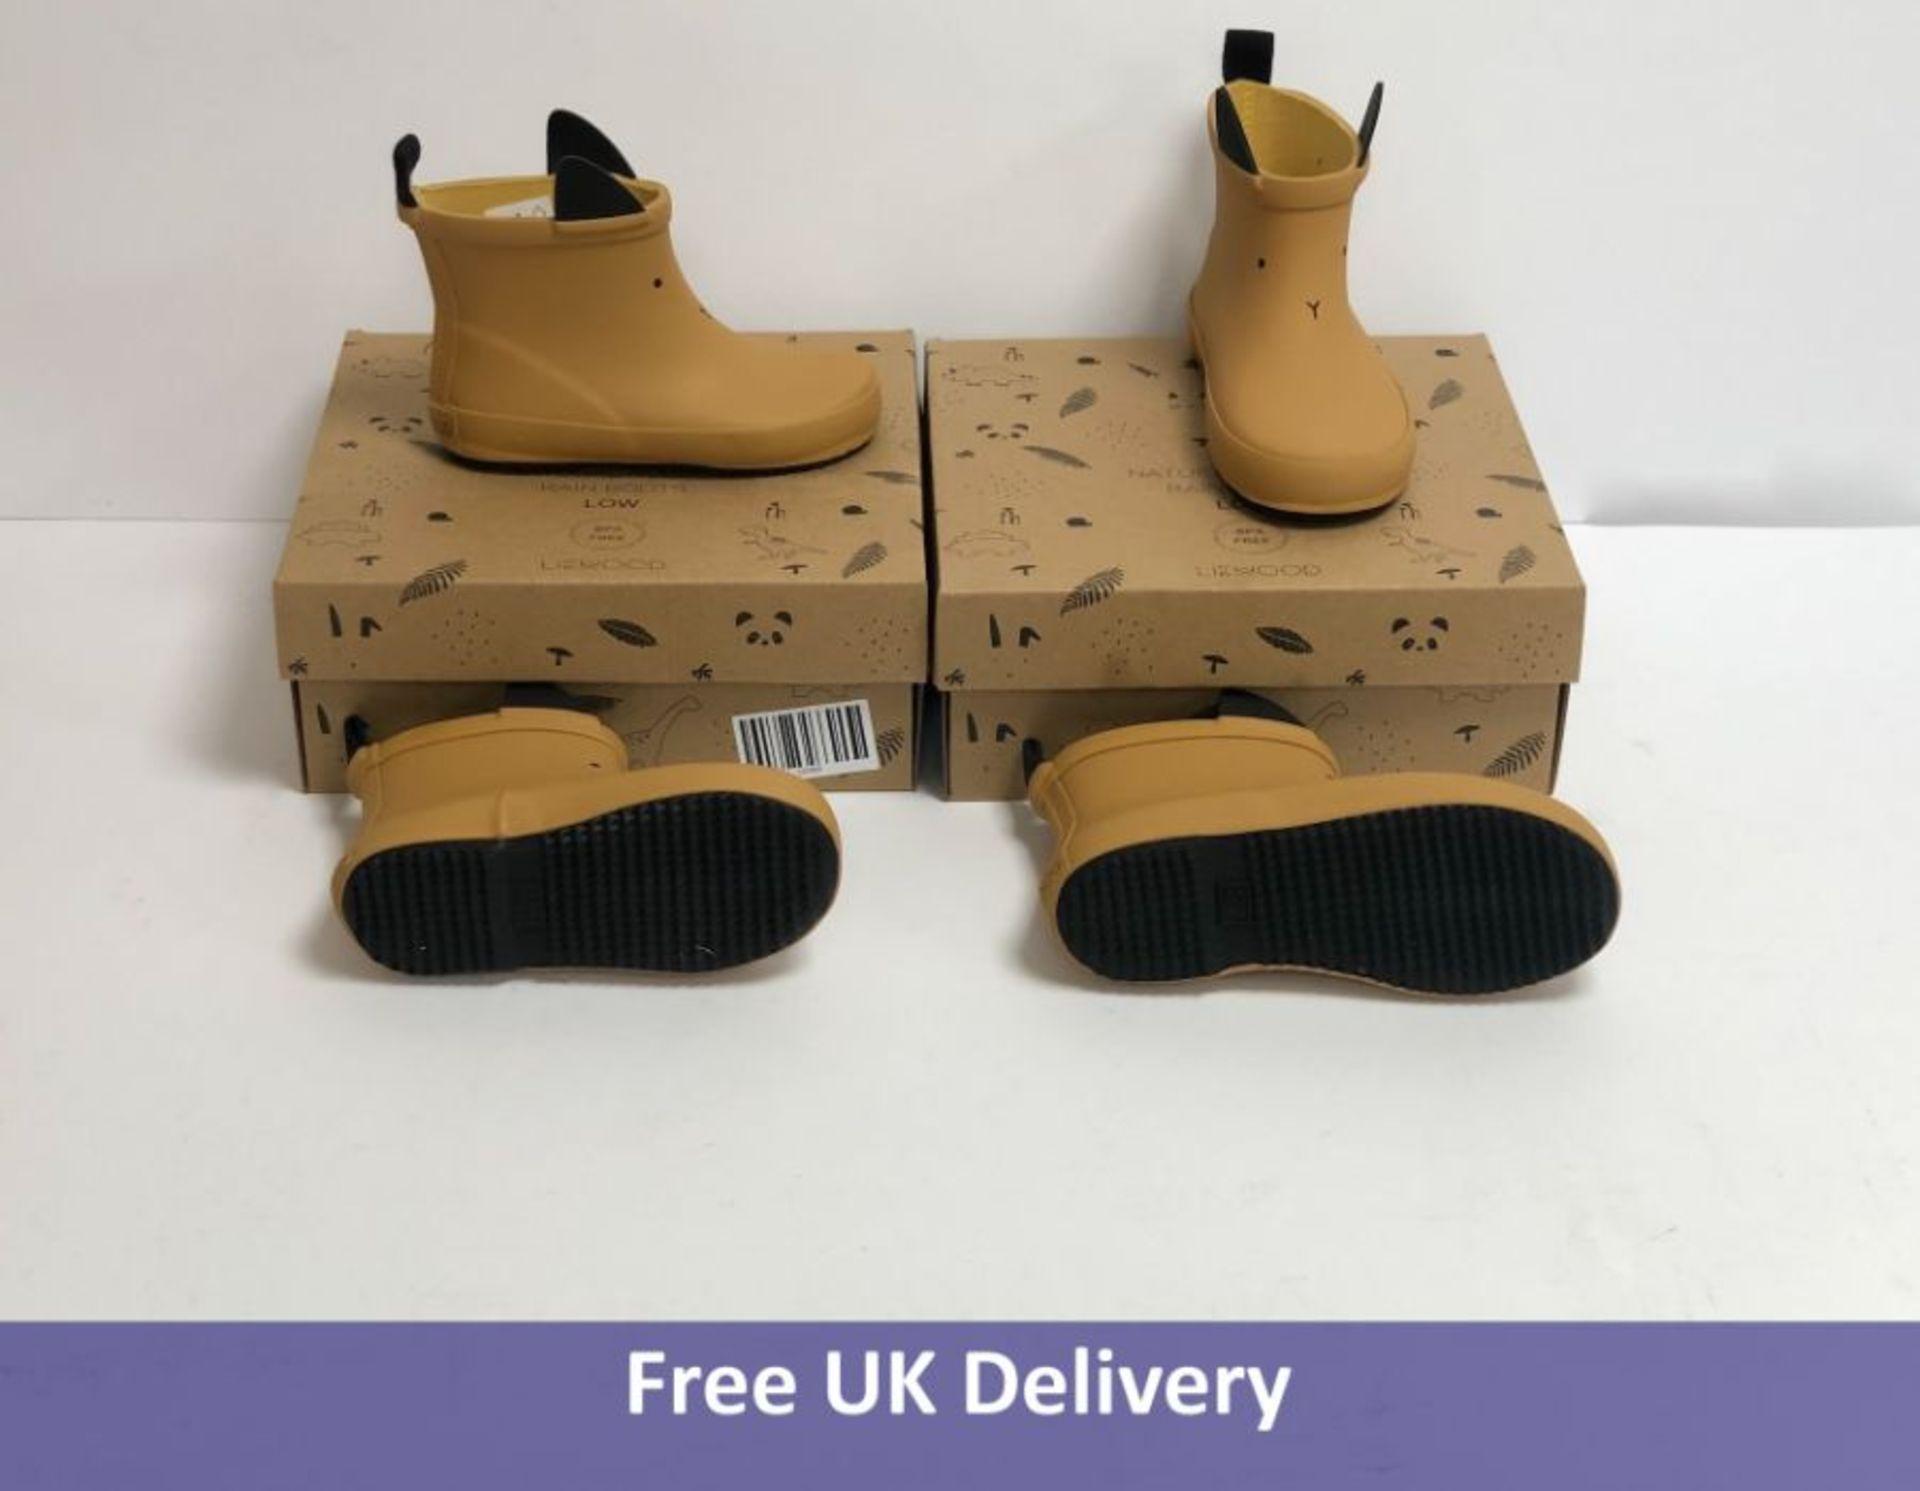 Two pairs of Liewood Infant Tobi Rain Boots, Rabbit, Mustard, UK 7